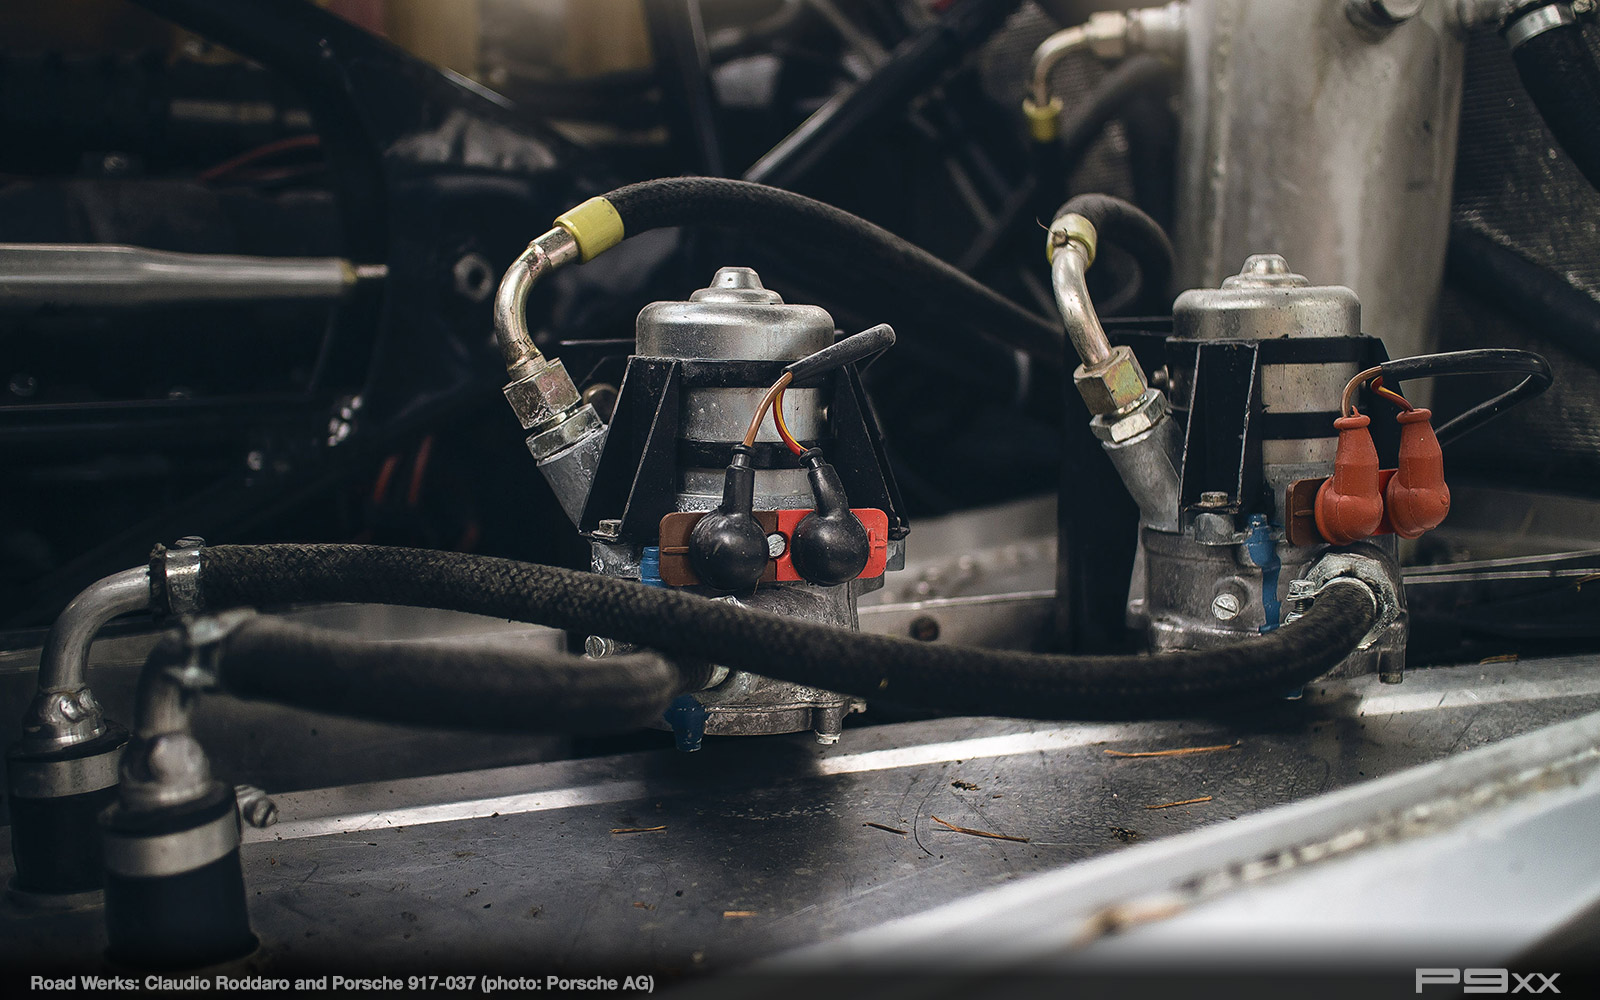 Porsche-917-037-Martini-Racing-Monaco-2018-300